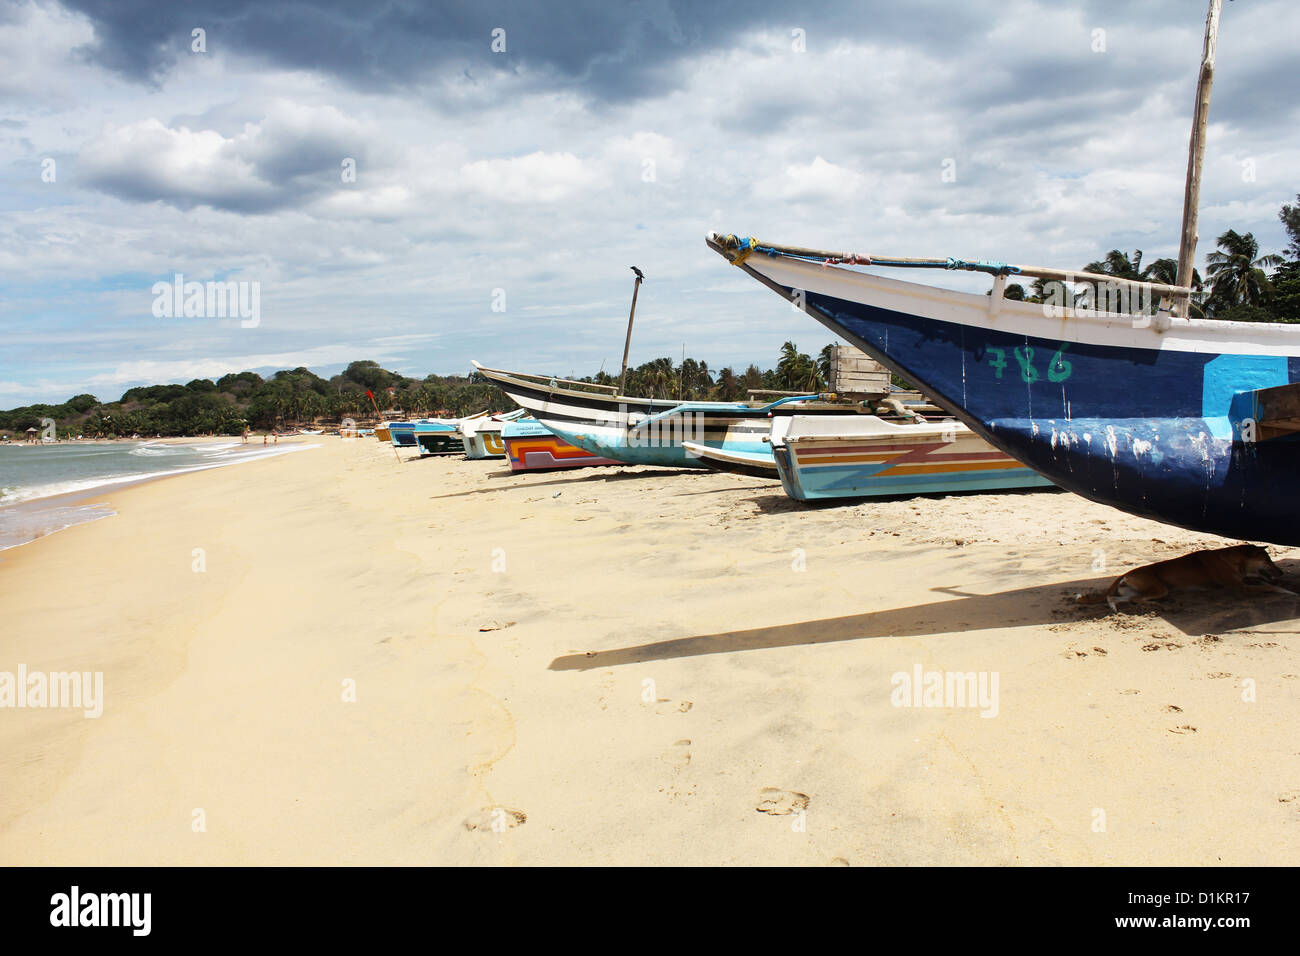 Boats on the beach at Arugam Bay Stock Photo